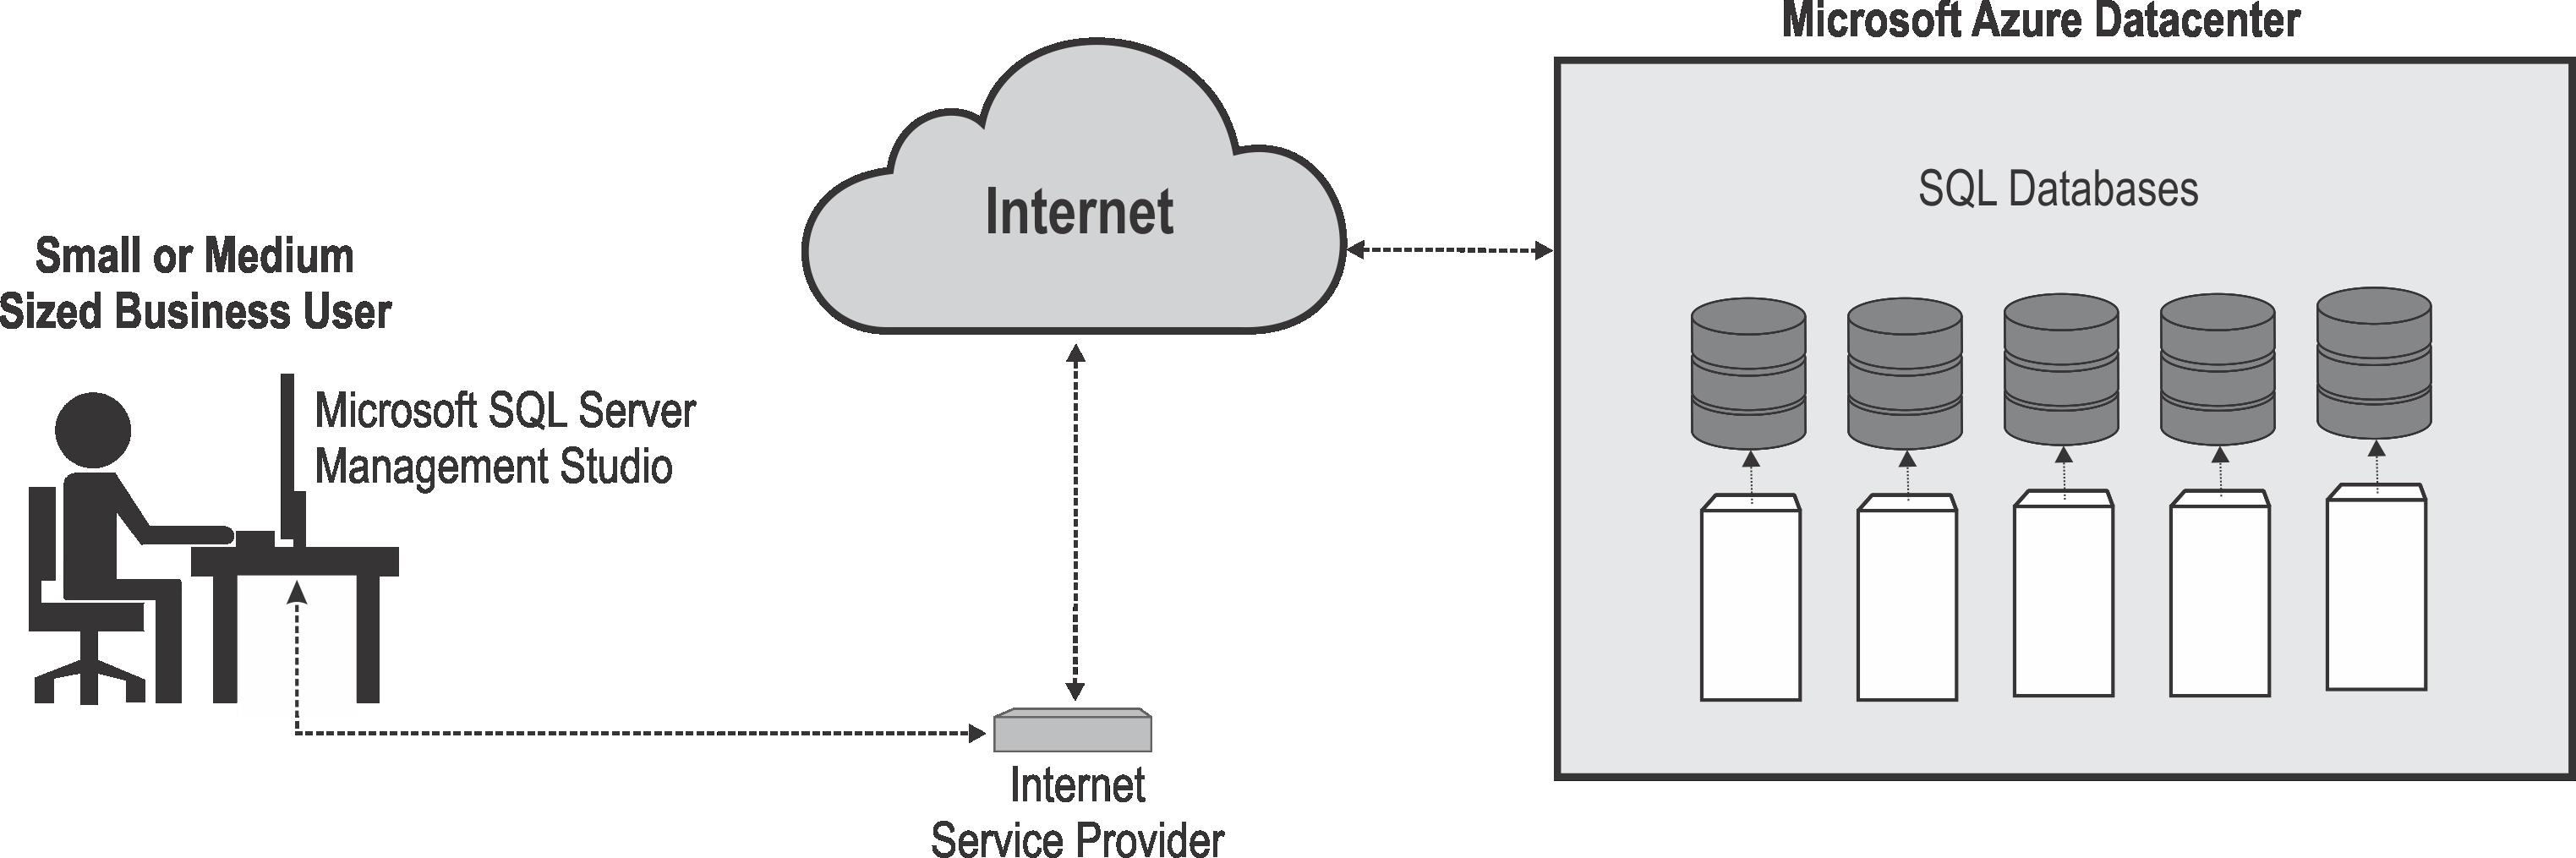 microsoft list server products